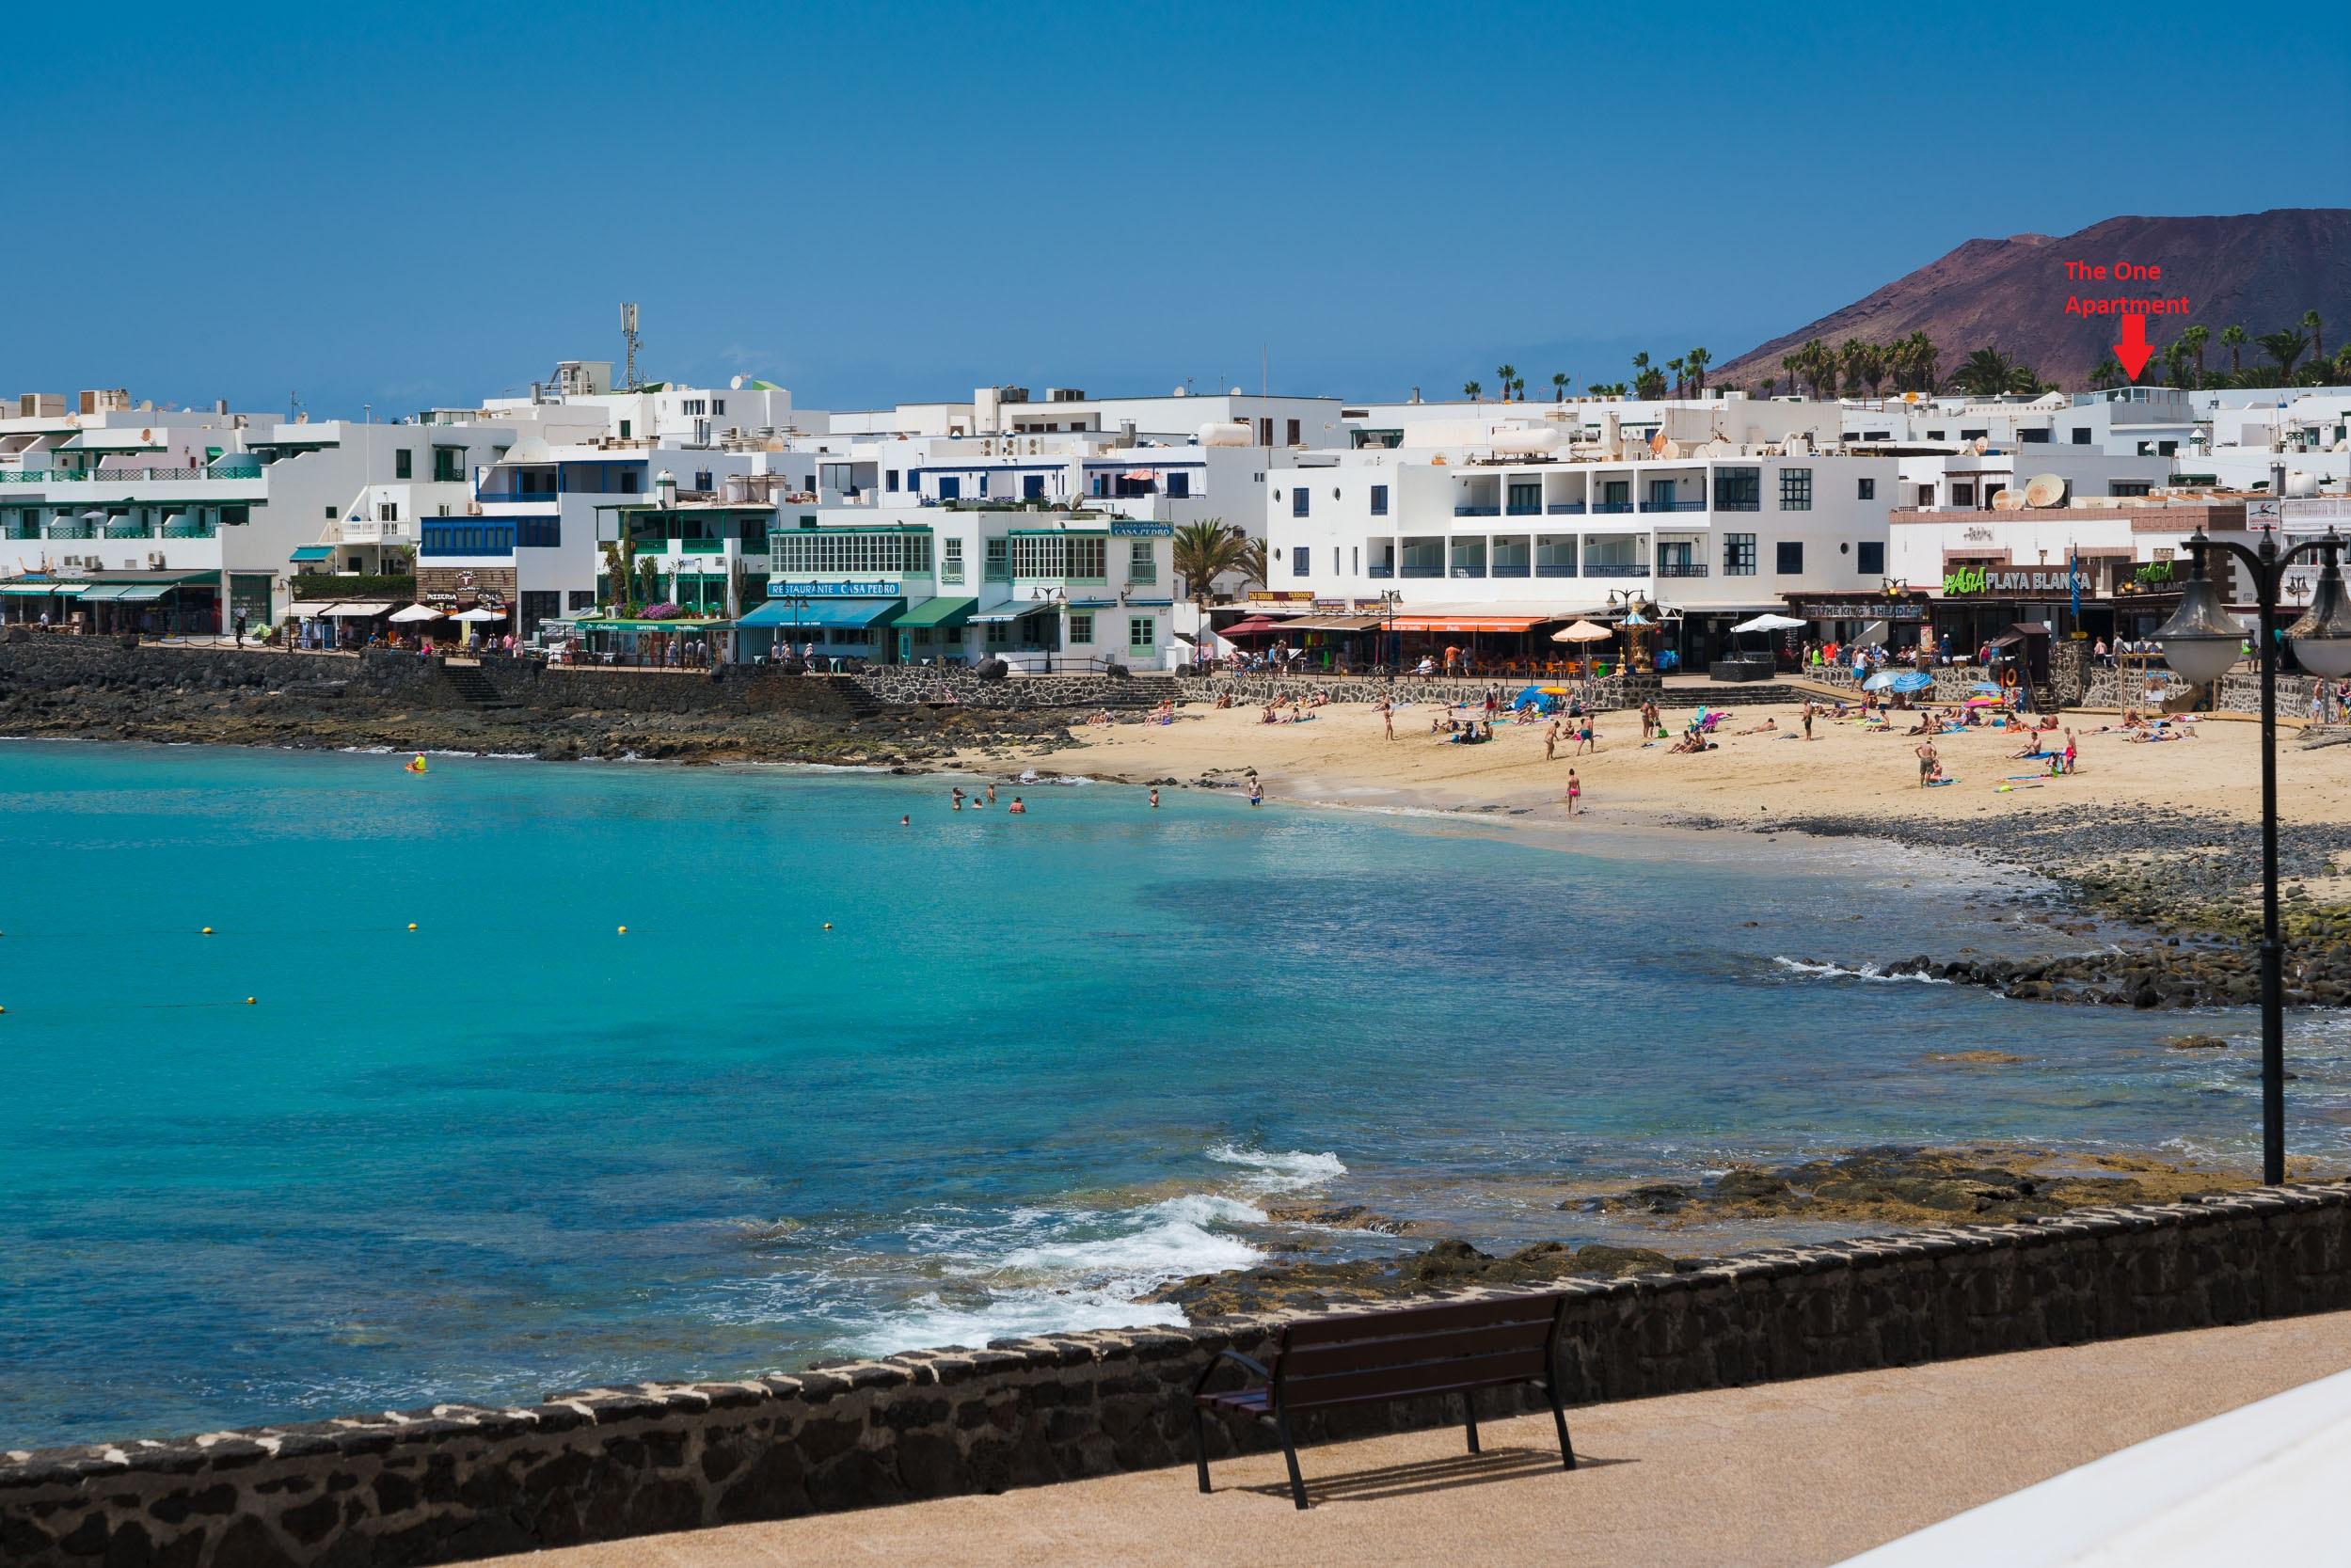 The One Apartment - Villas Playa Blanca